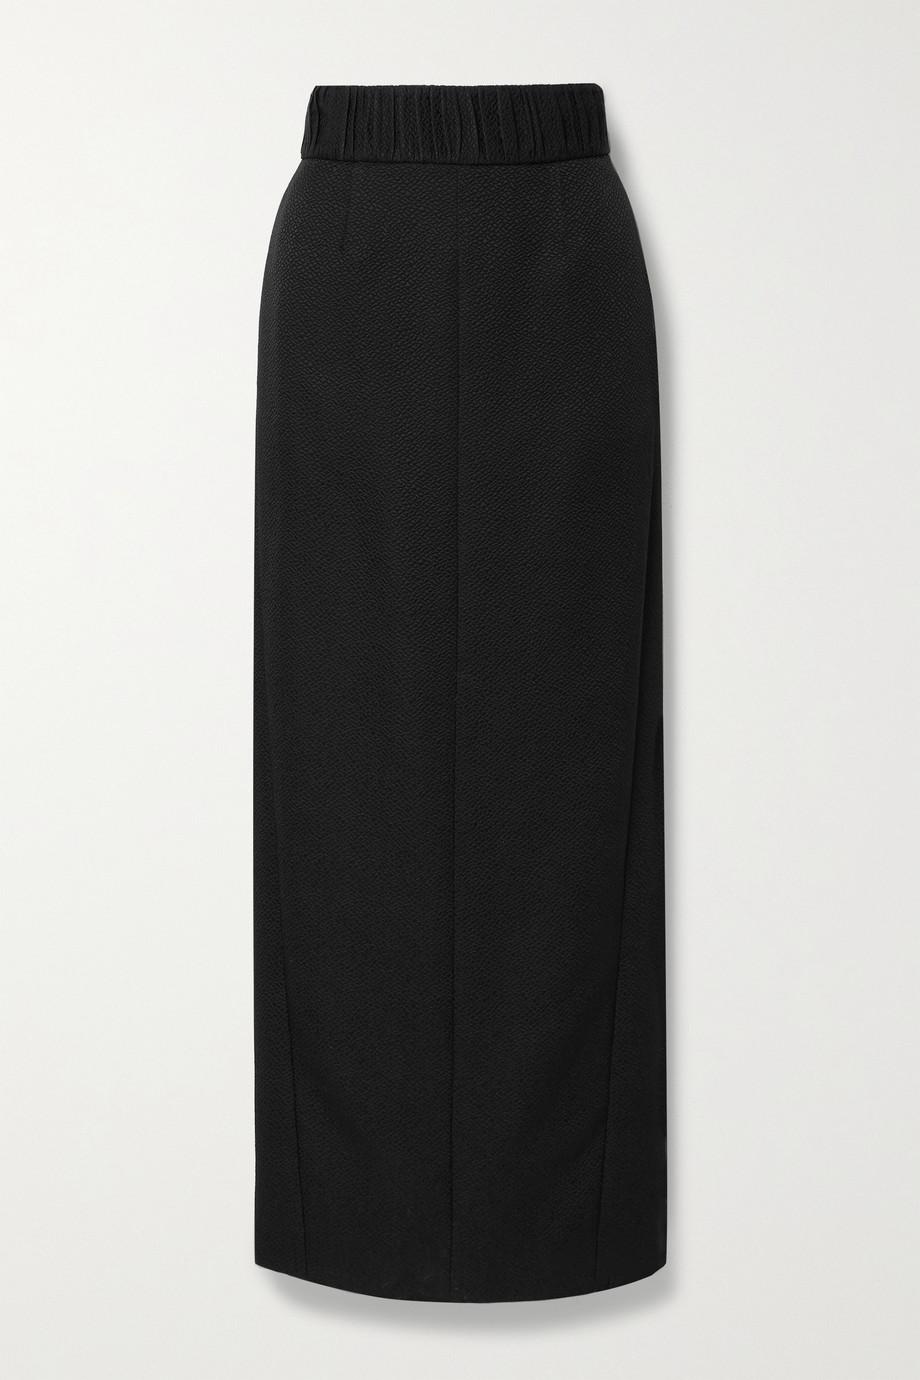 TOVE Celeste cotton and silk-blend jacquard maxi skirt